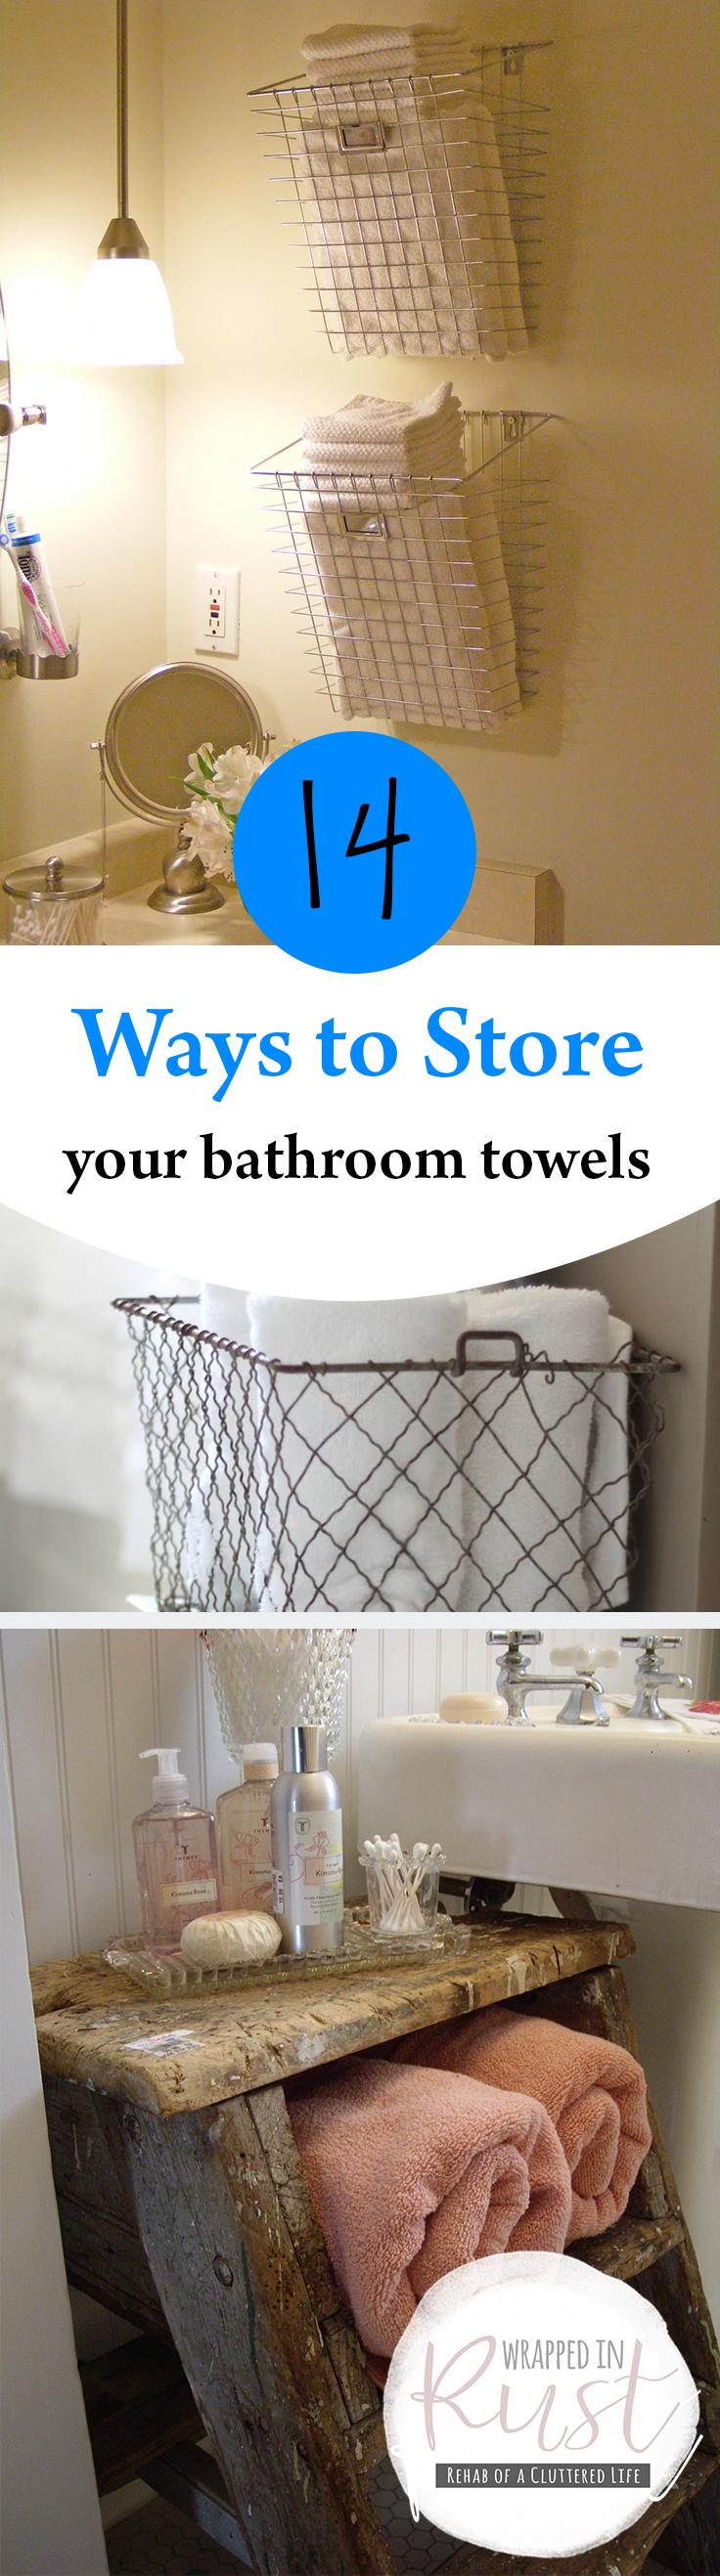 Bathroom, Bathroom Storage, How to Store Bathroom Towels, Unique Bathroom Storage Ideas, Small Bathroom Storage Ideas, Popular Pin, Bathroom Storage for Less, Bathroom Towels